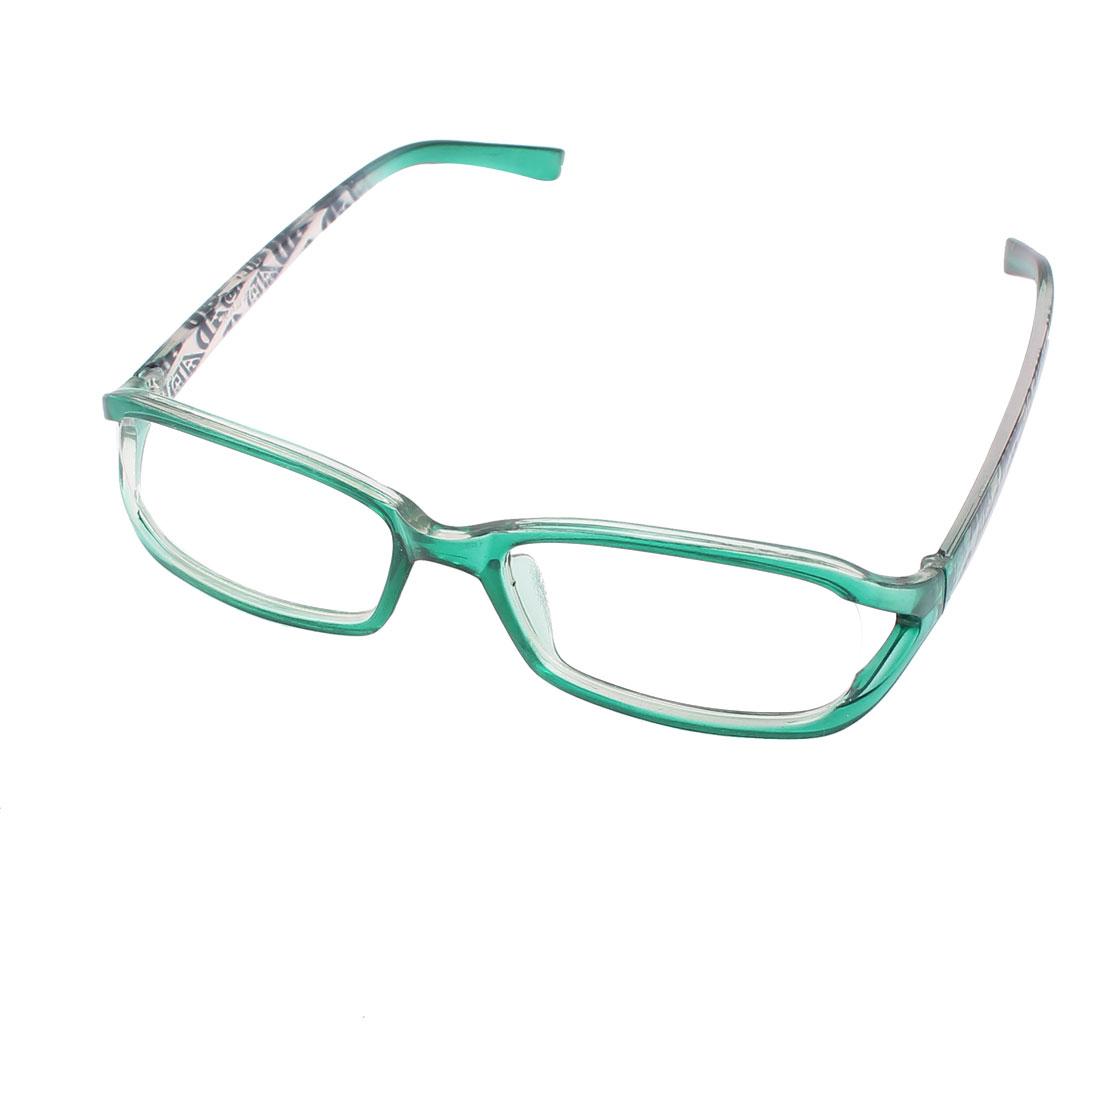 Green Plastic Arms Full Rim Single Bridge Clear Lens Plain Glasses Plano Spectacle